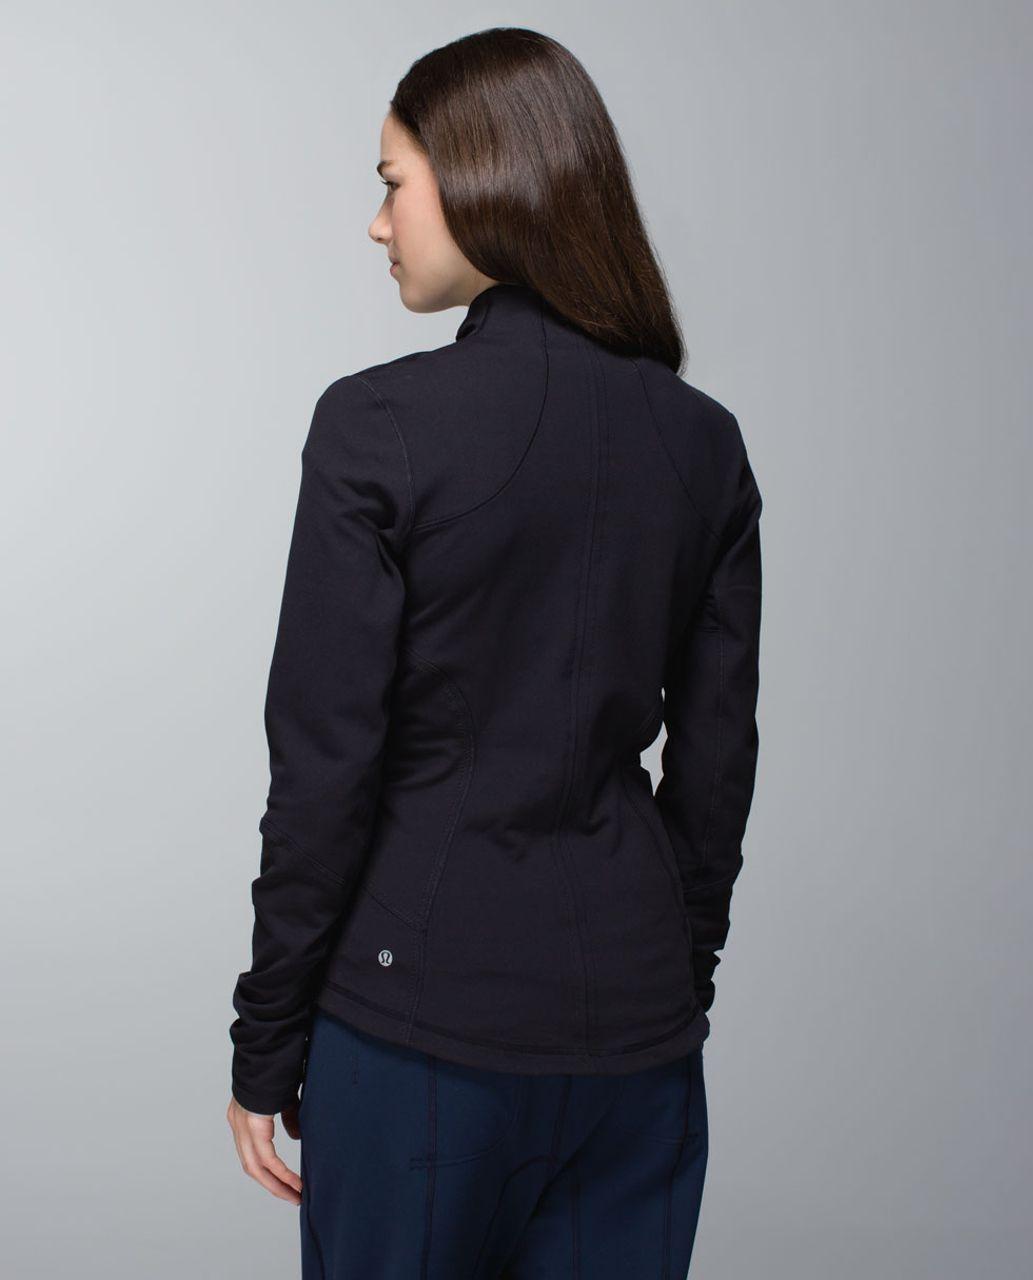 Lululemon Forme Jacket - Black